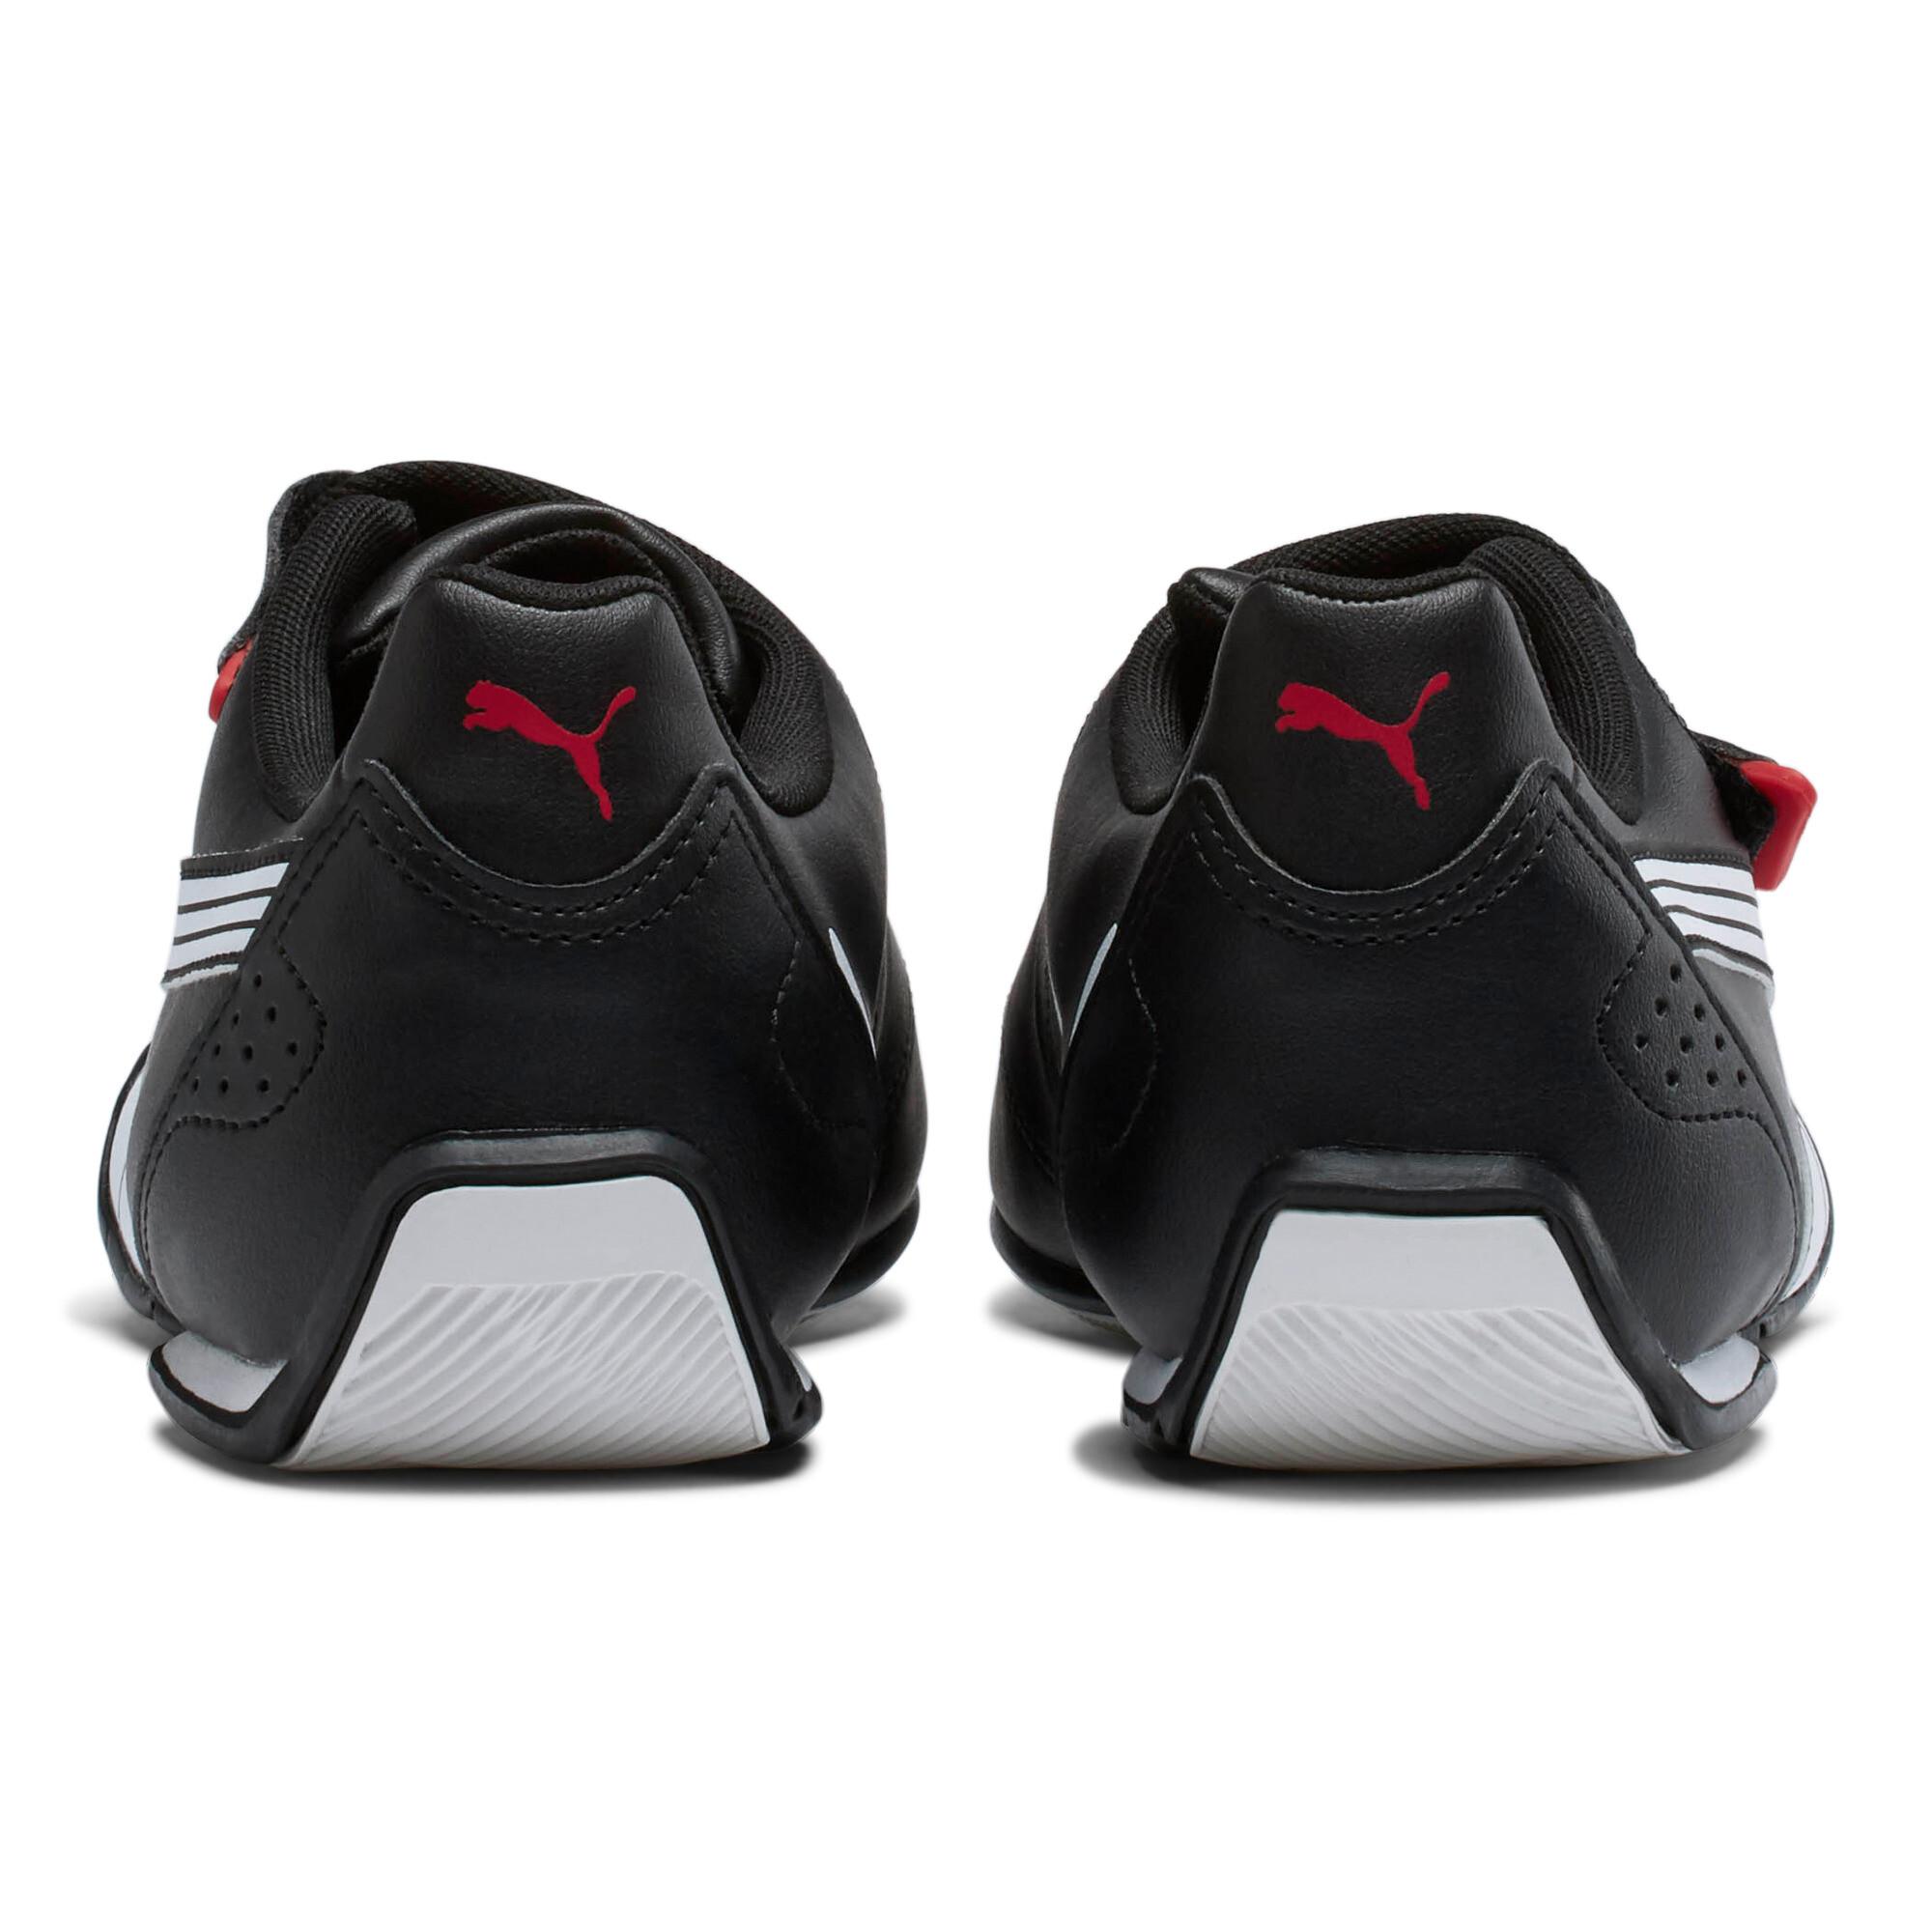 miniature 7 - Puma Men's Redon Move Shoes